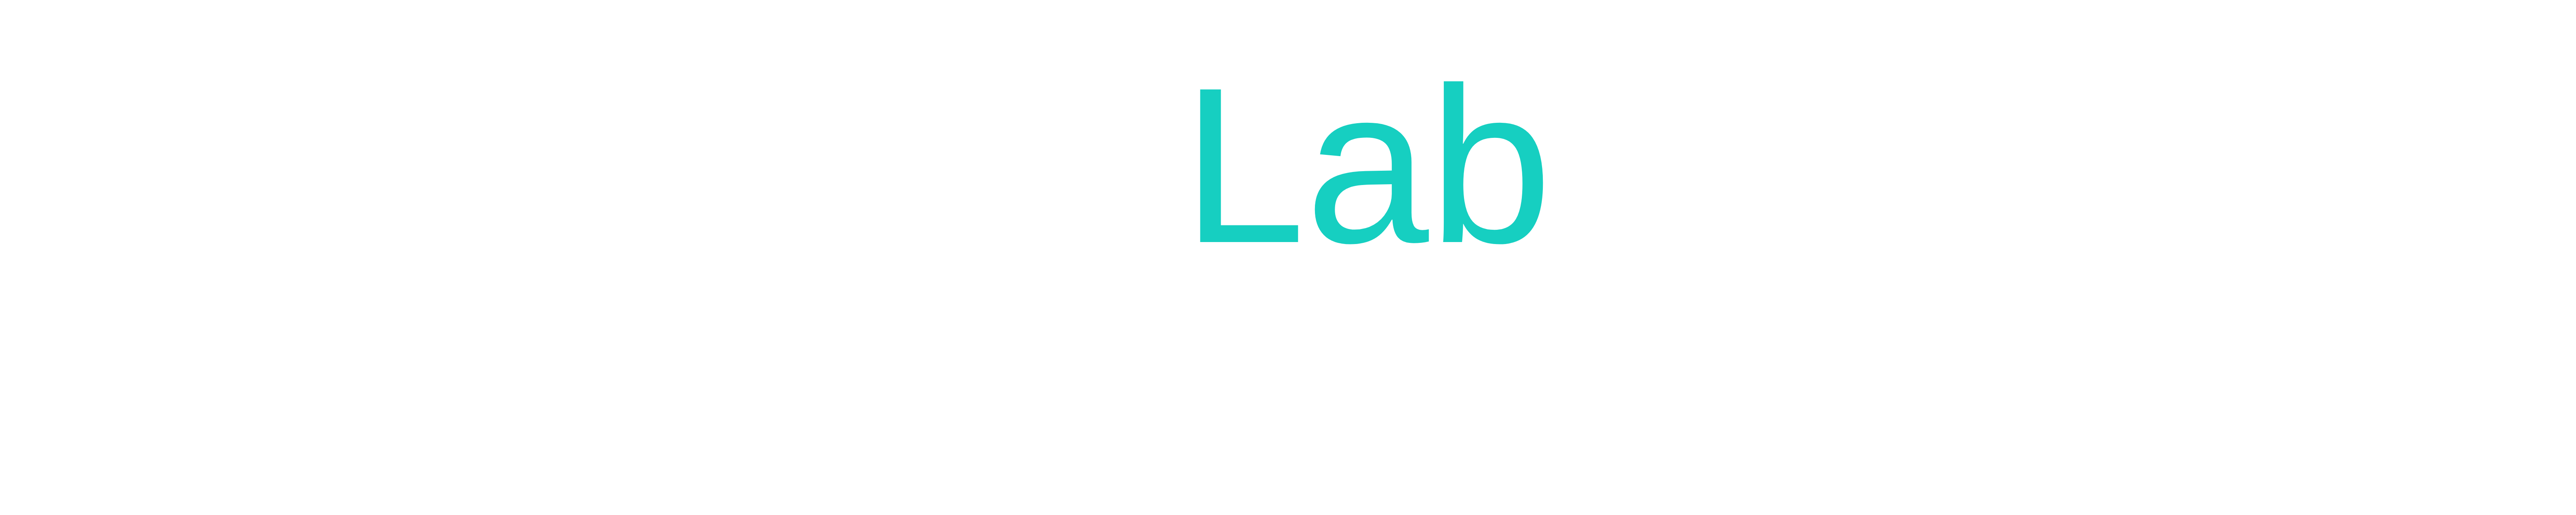 Lorincz Lab